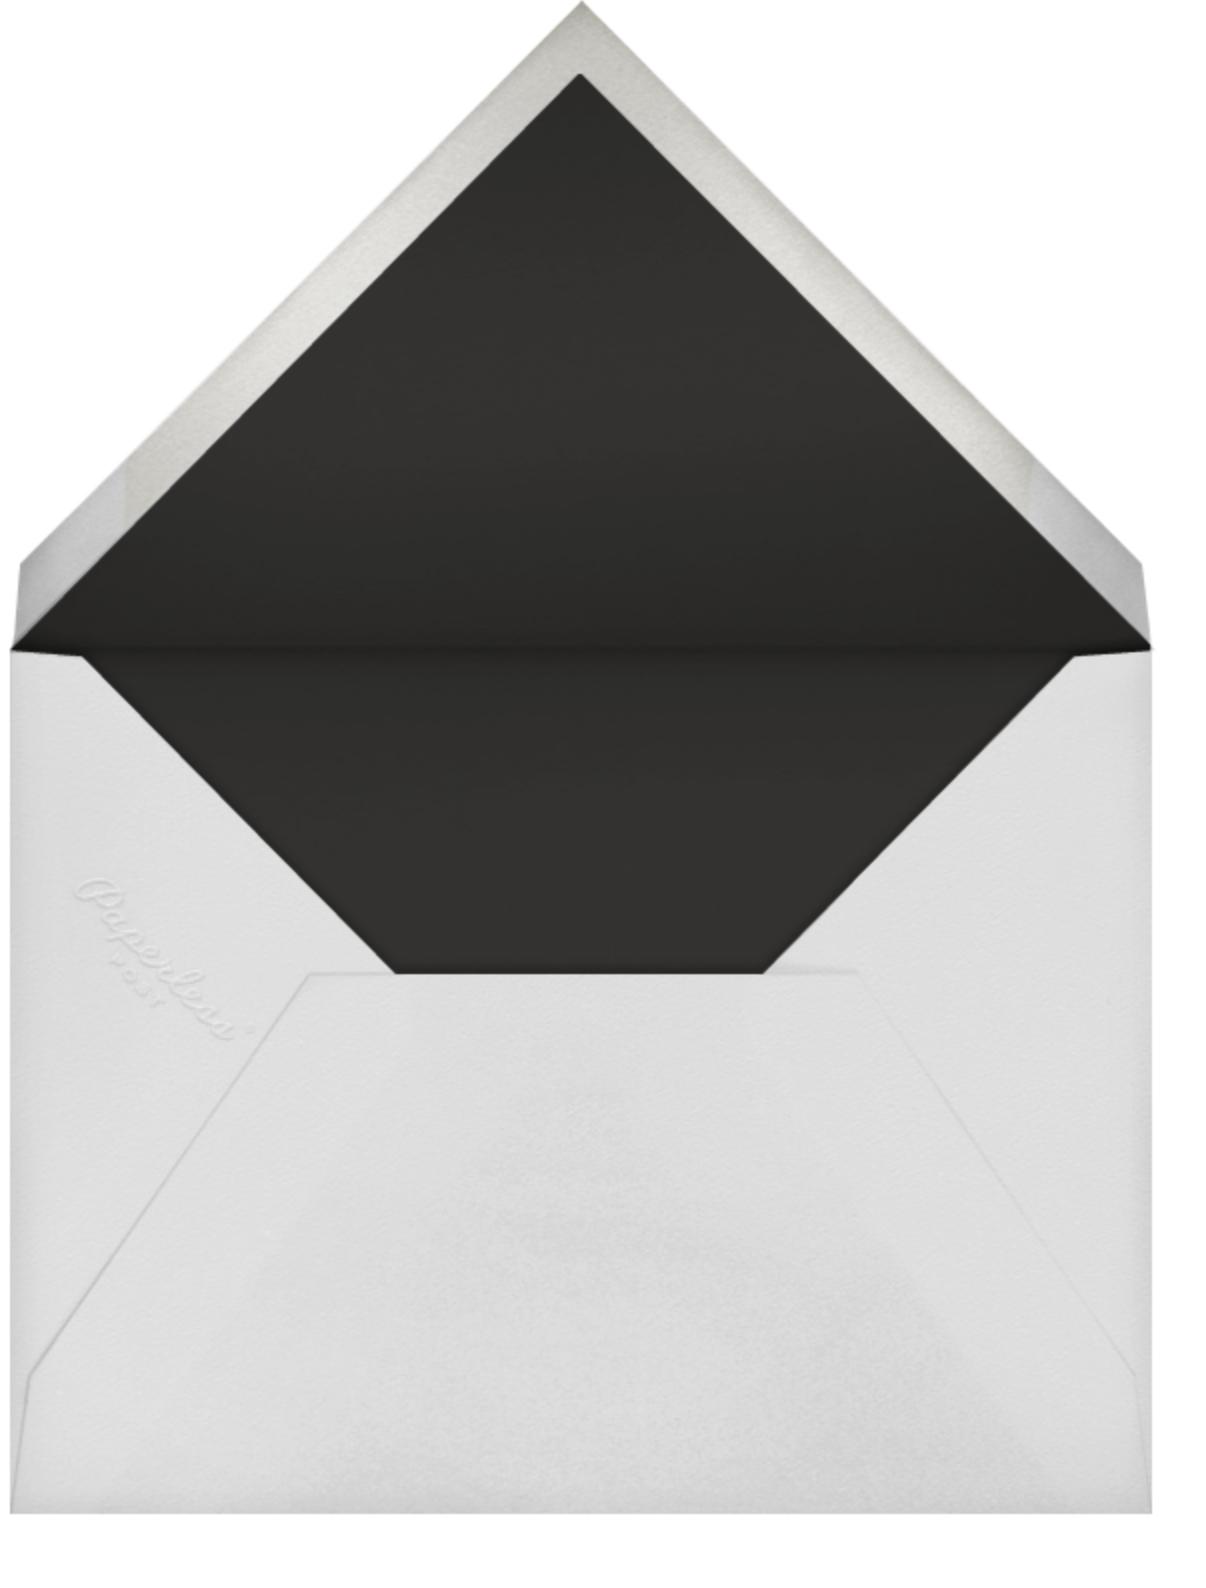 Tulip Dot - Wedgewood/Silver - Oscar de la Renta - Envelope